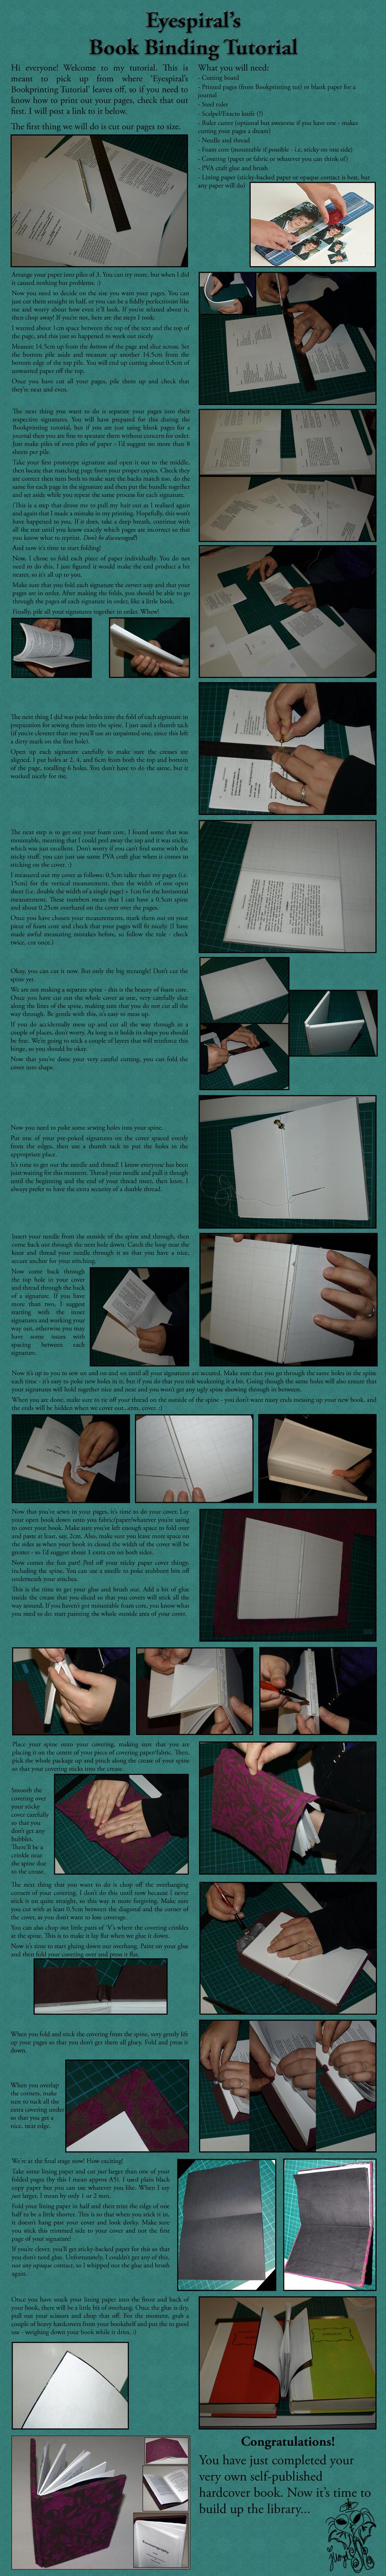 Book Binding Tutorial by Eyespiral-stock